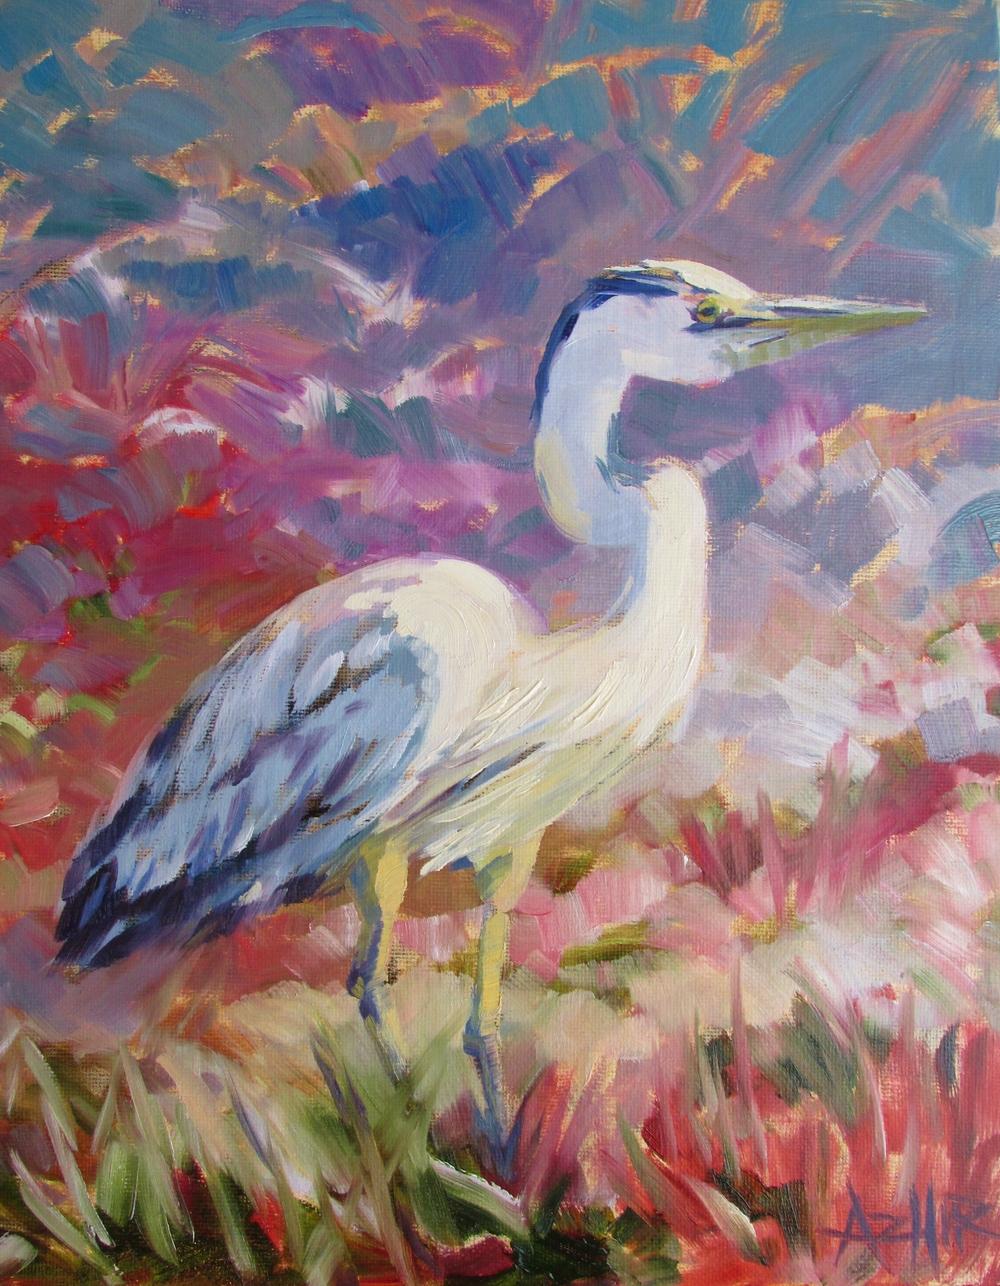 "SOLD, The Crane, Copyright 2016 Hirschten, Oil on Canvas 11"" x 14"""